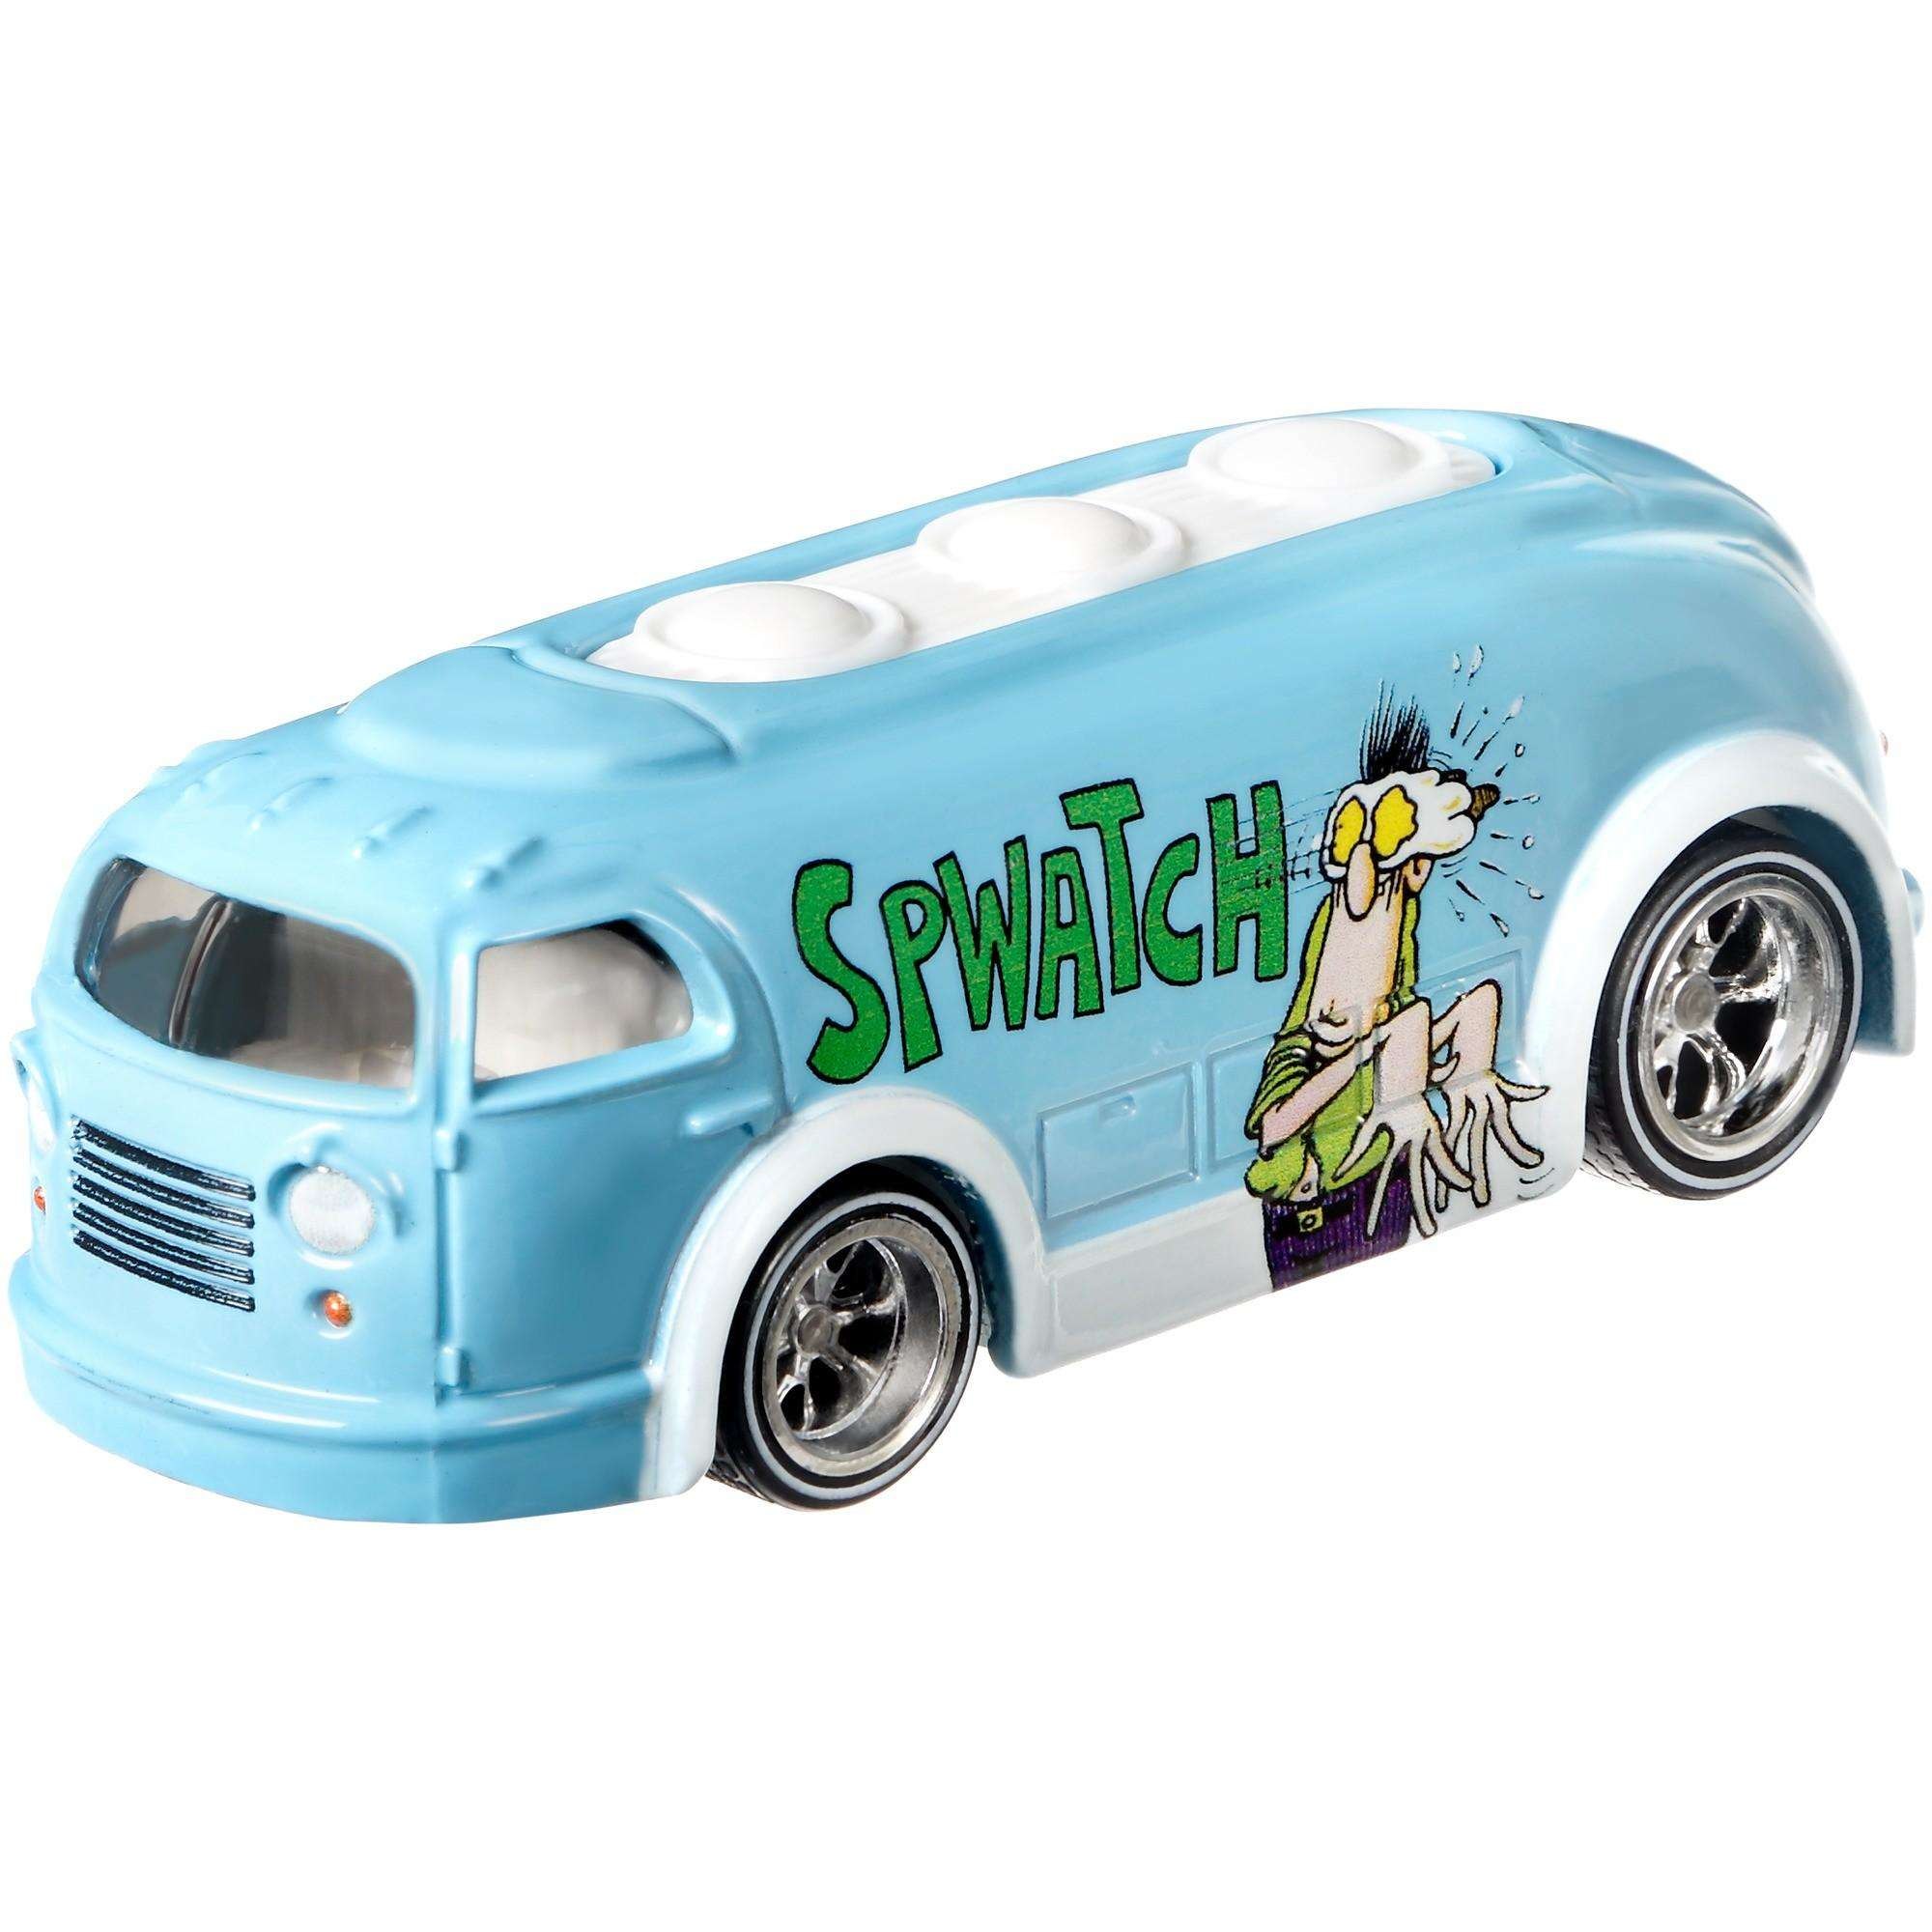 Hot Wheels Pop Culture Haulin' Gas Vehicle by Mattel